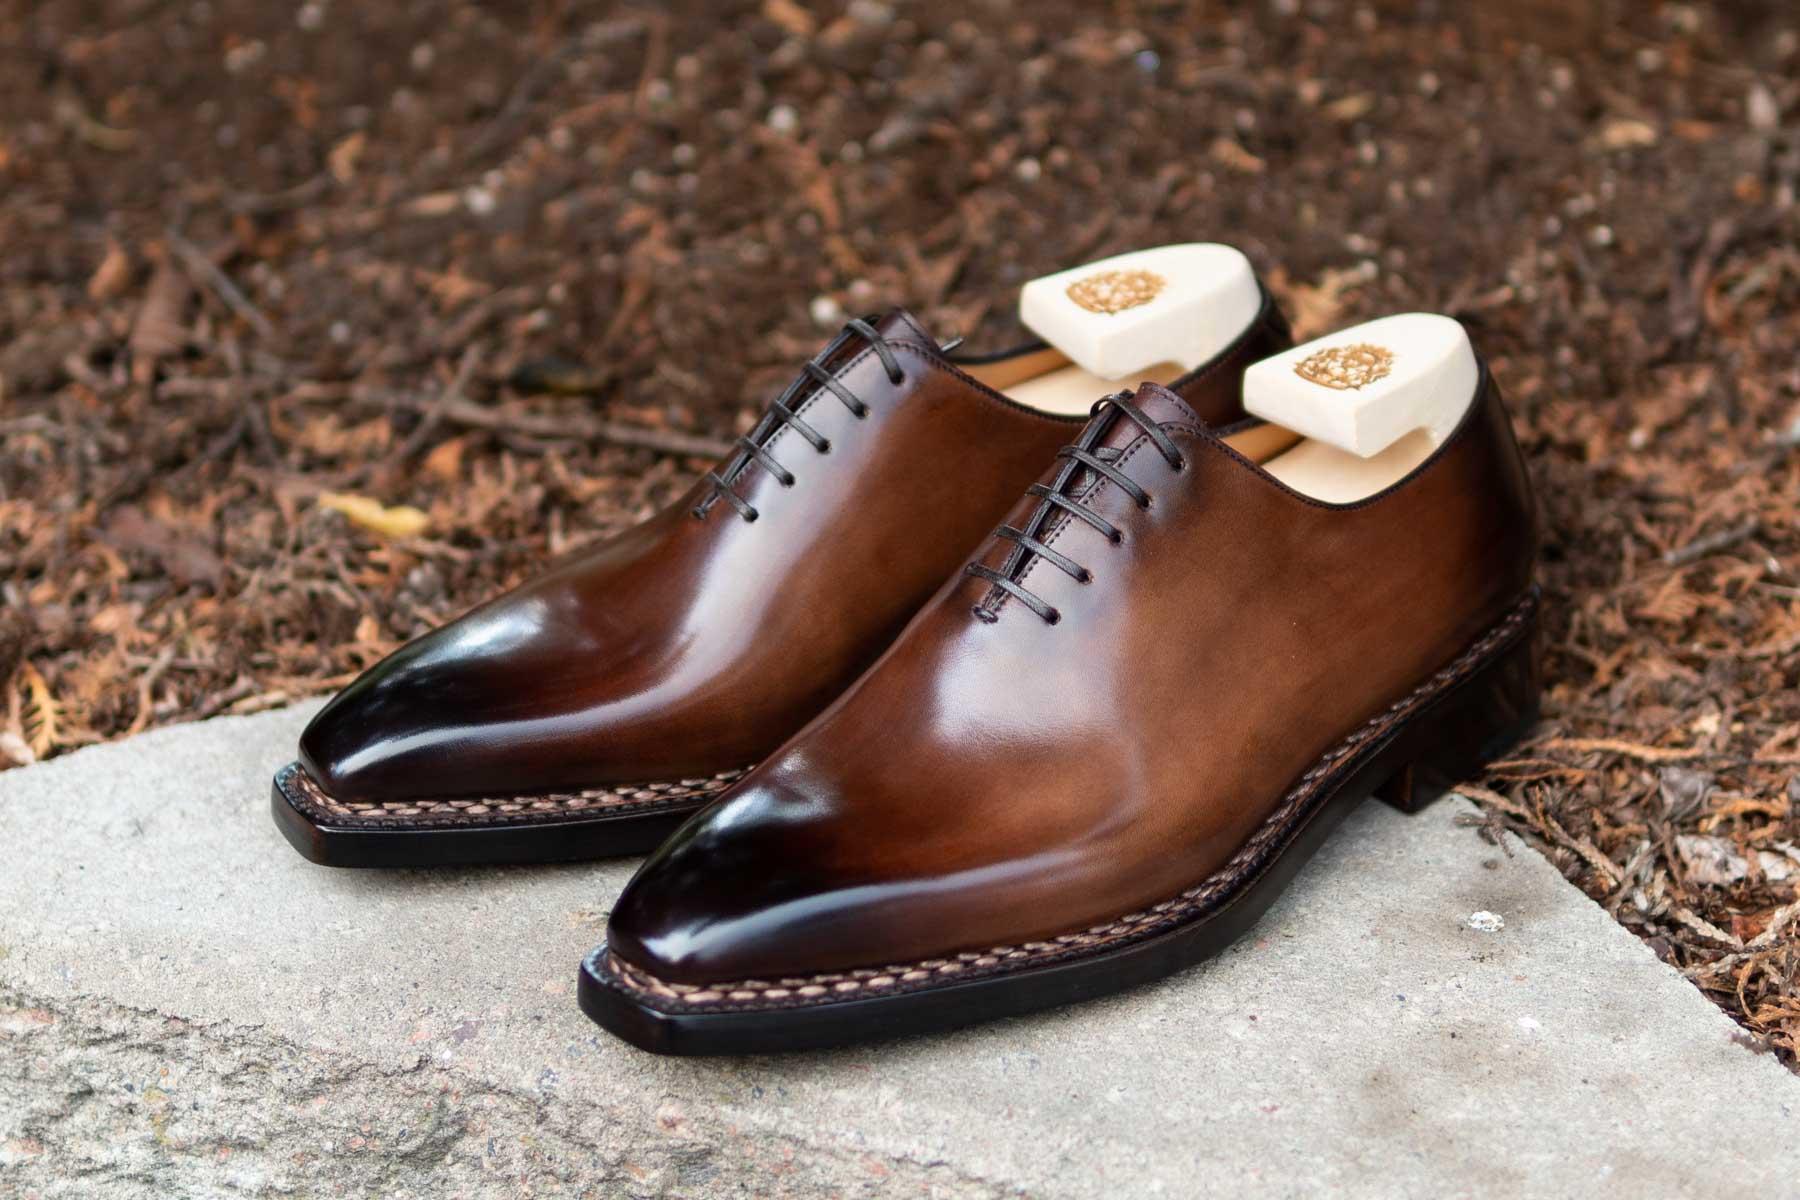 Best 10 Men's Dress Shoe Brands 2020 | Paolo Scafora Wholecut in Montella Calf for The Noble Shoe